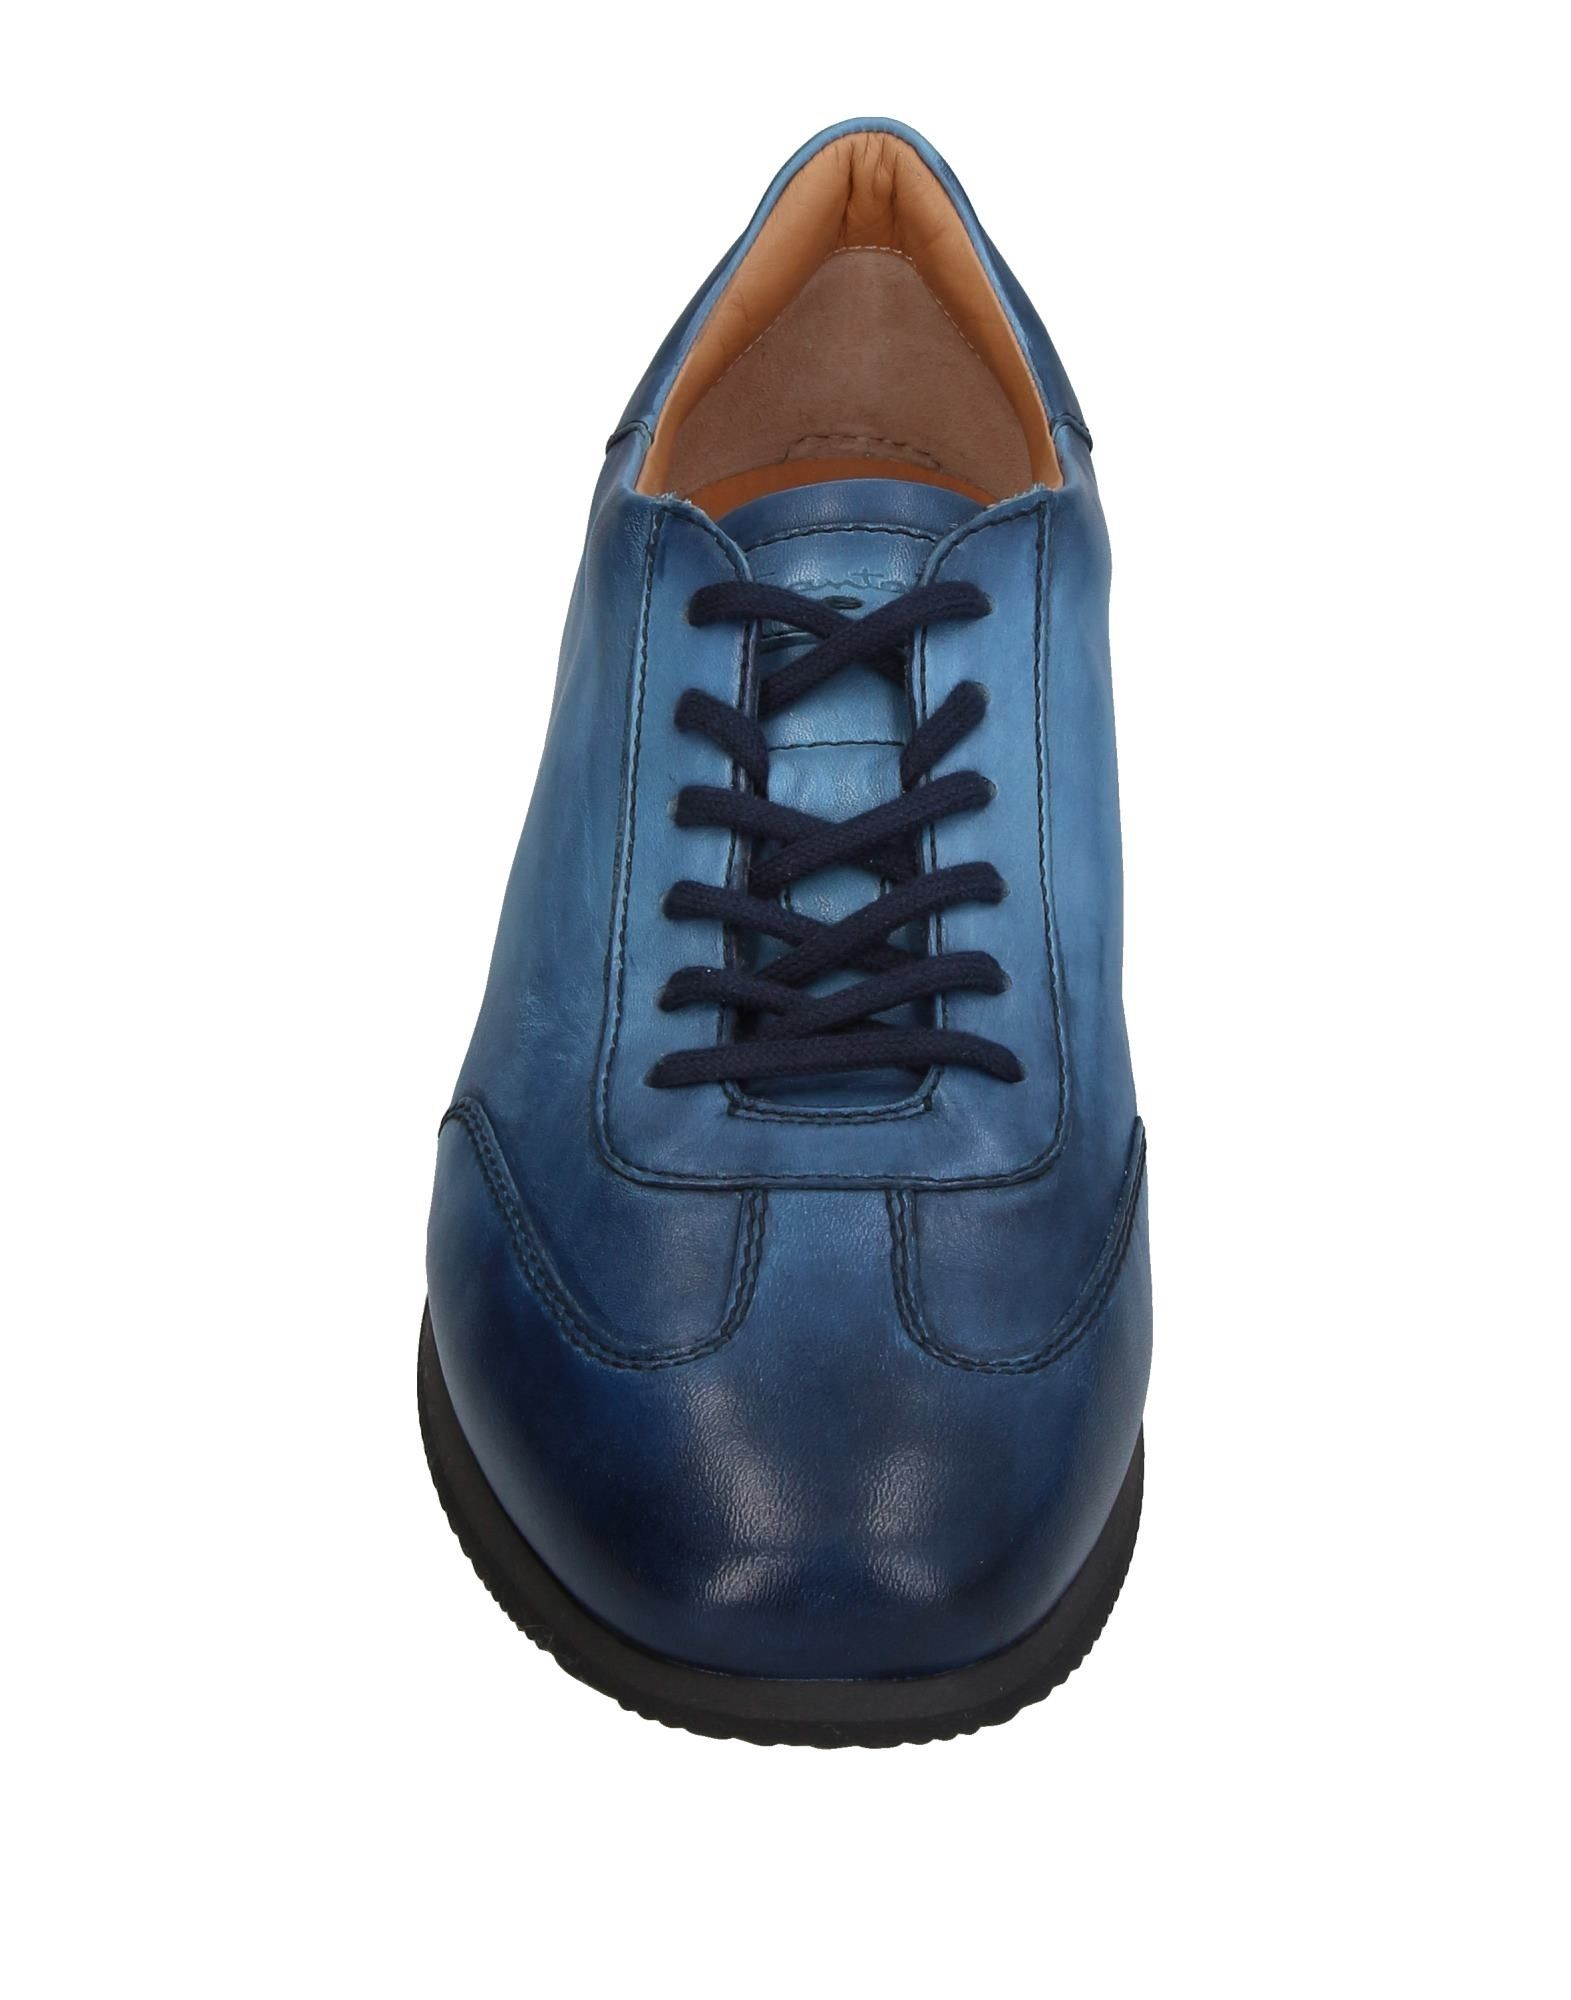 Schuhe Santoni Sneakers Herren  11409562KO Heiße Schuhe  e17834